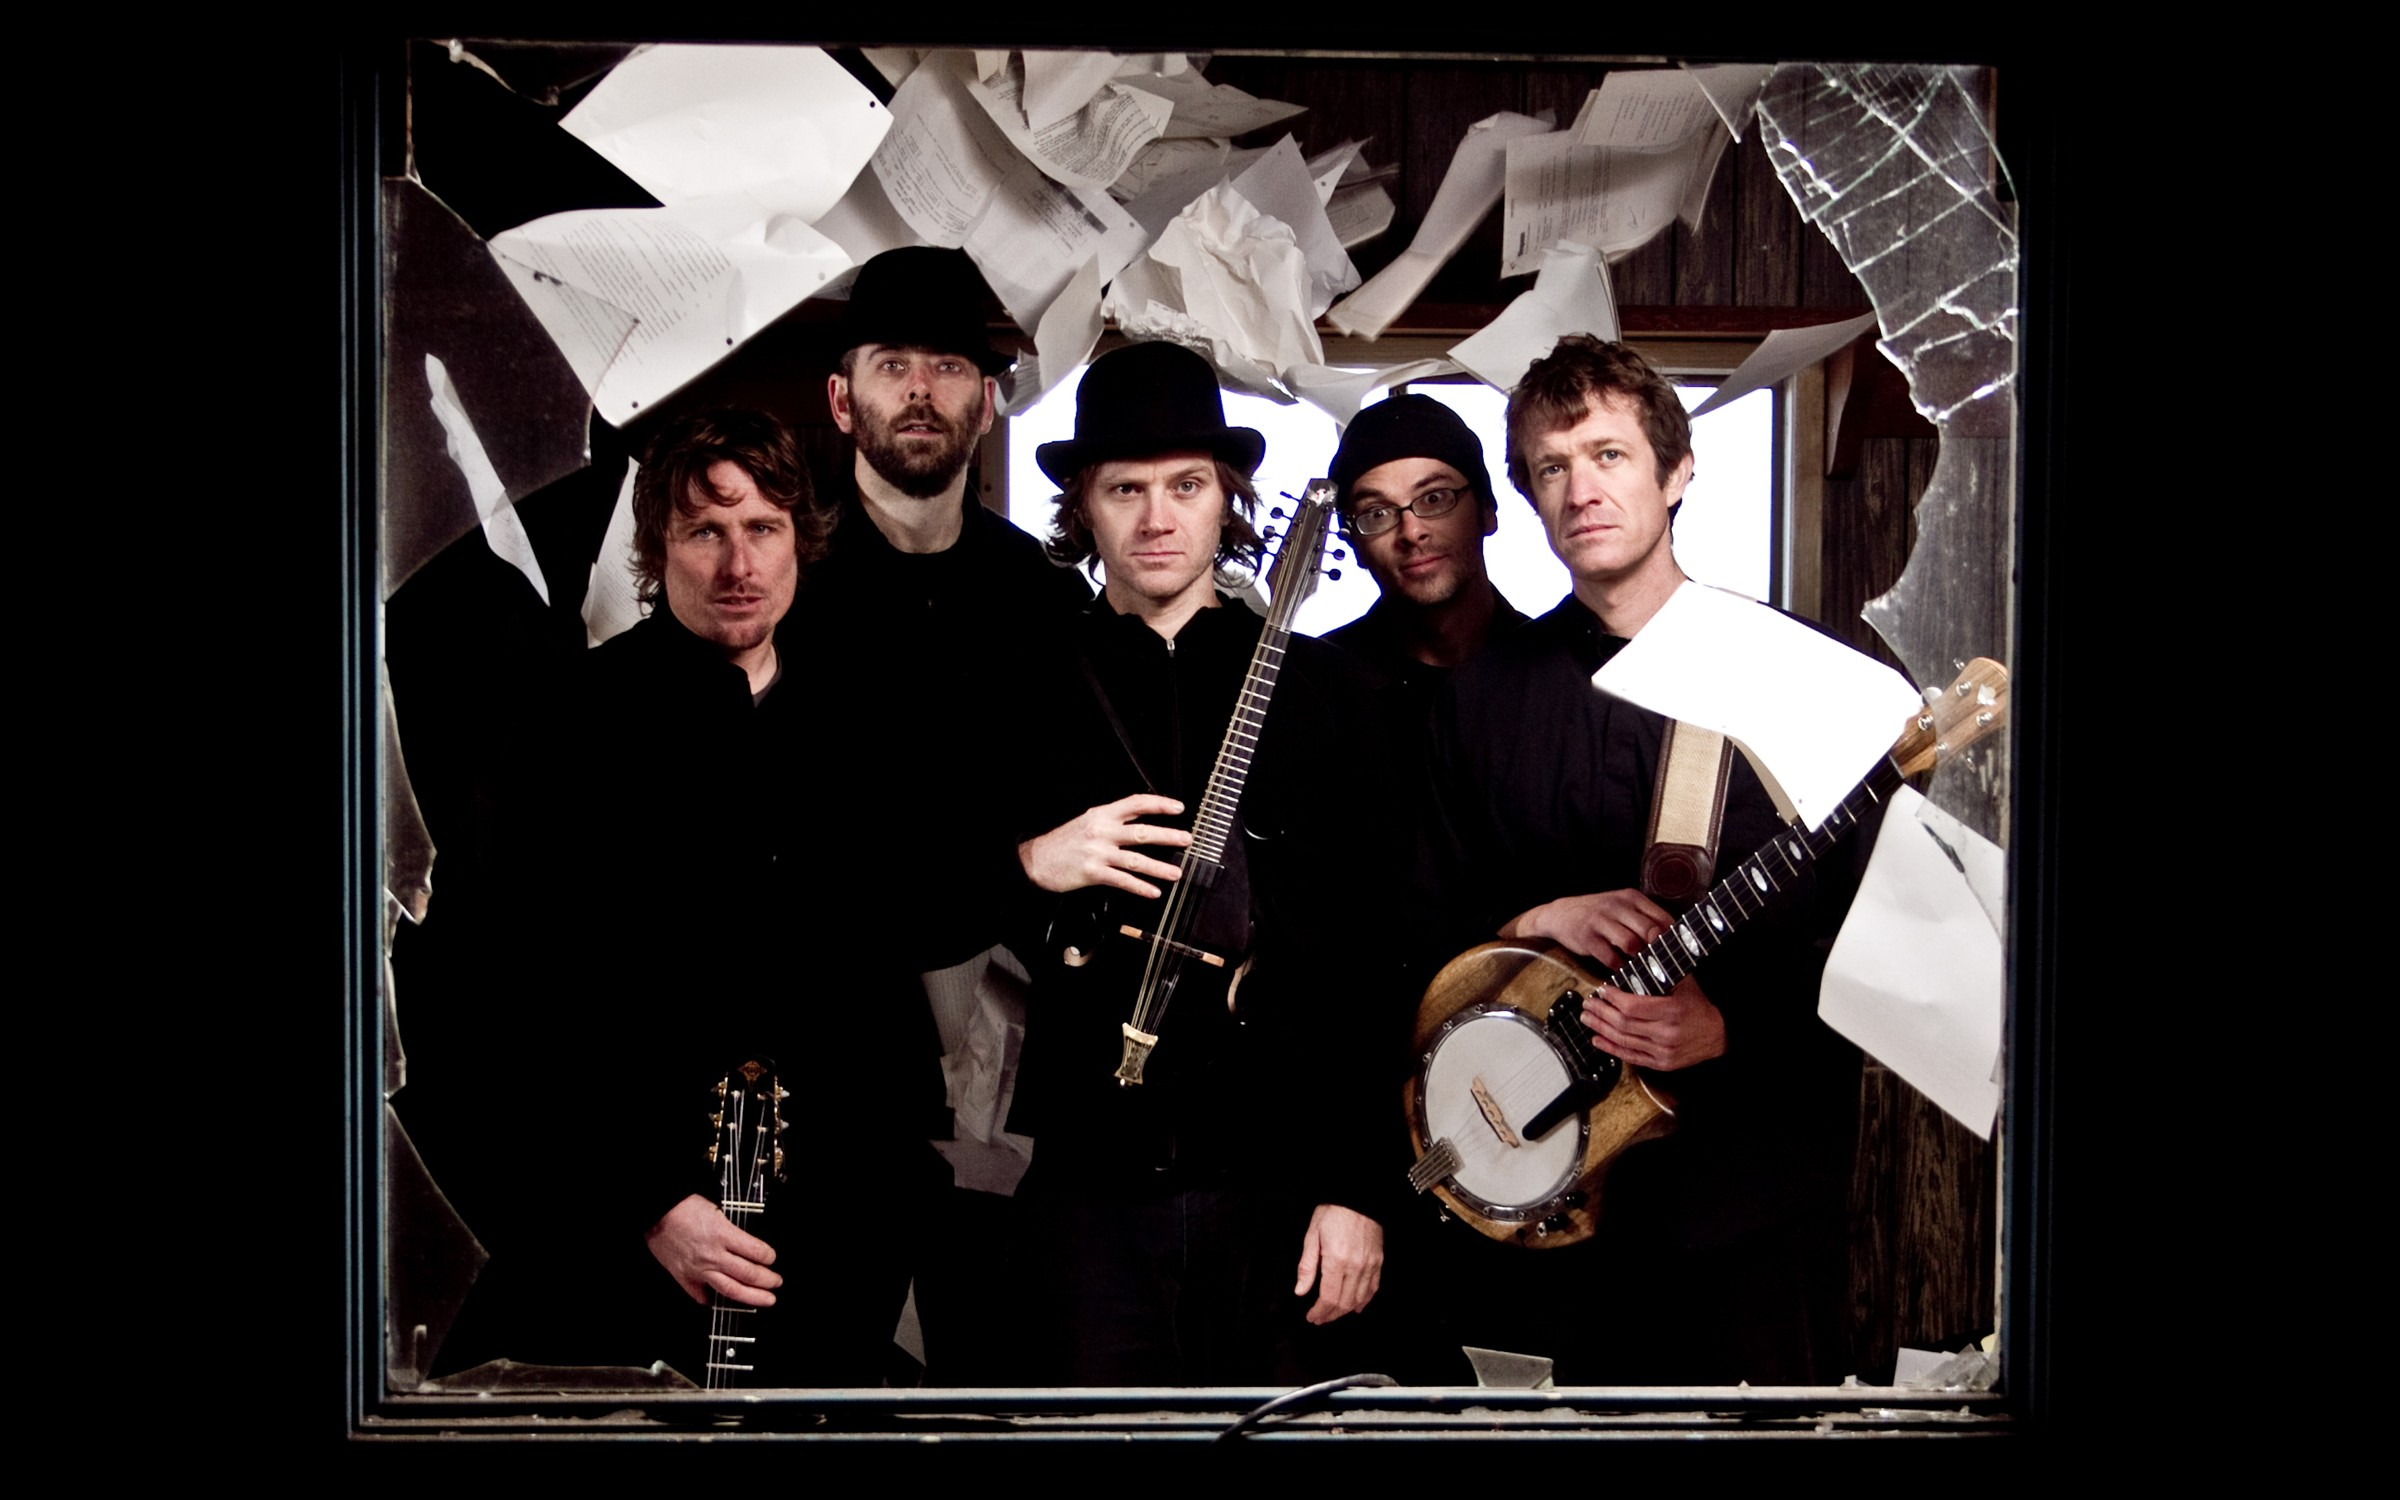 Absynth Quintet - PHOTO BY TERRENCE MCNALLY - ARCATAPHOTO.COM